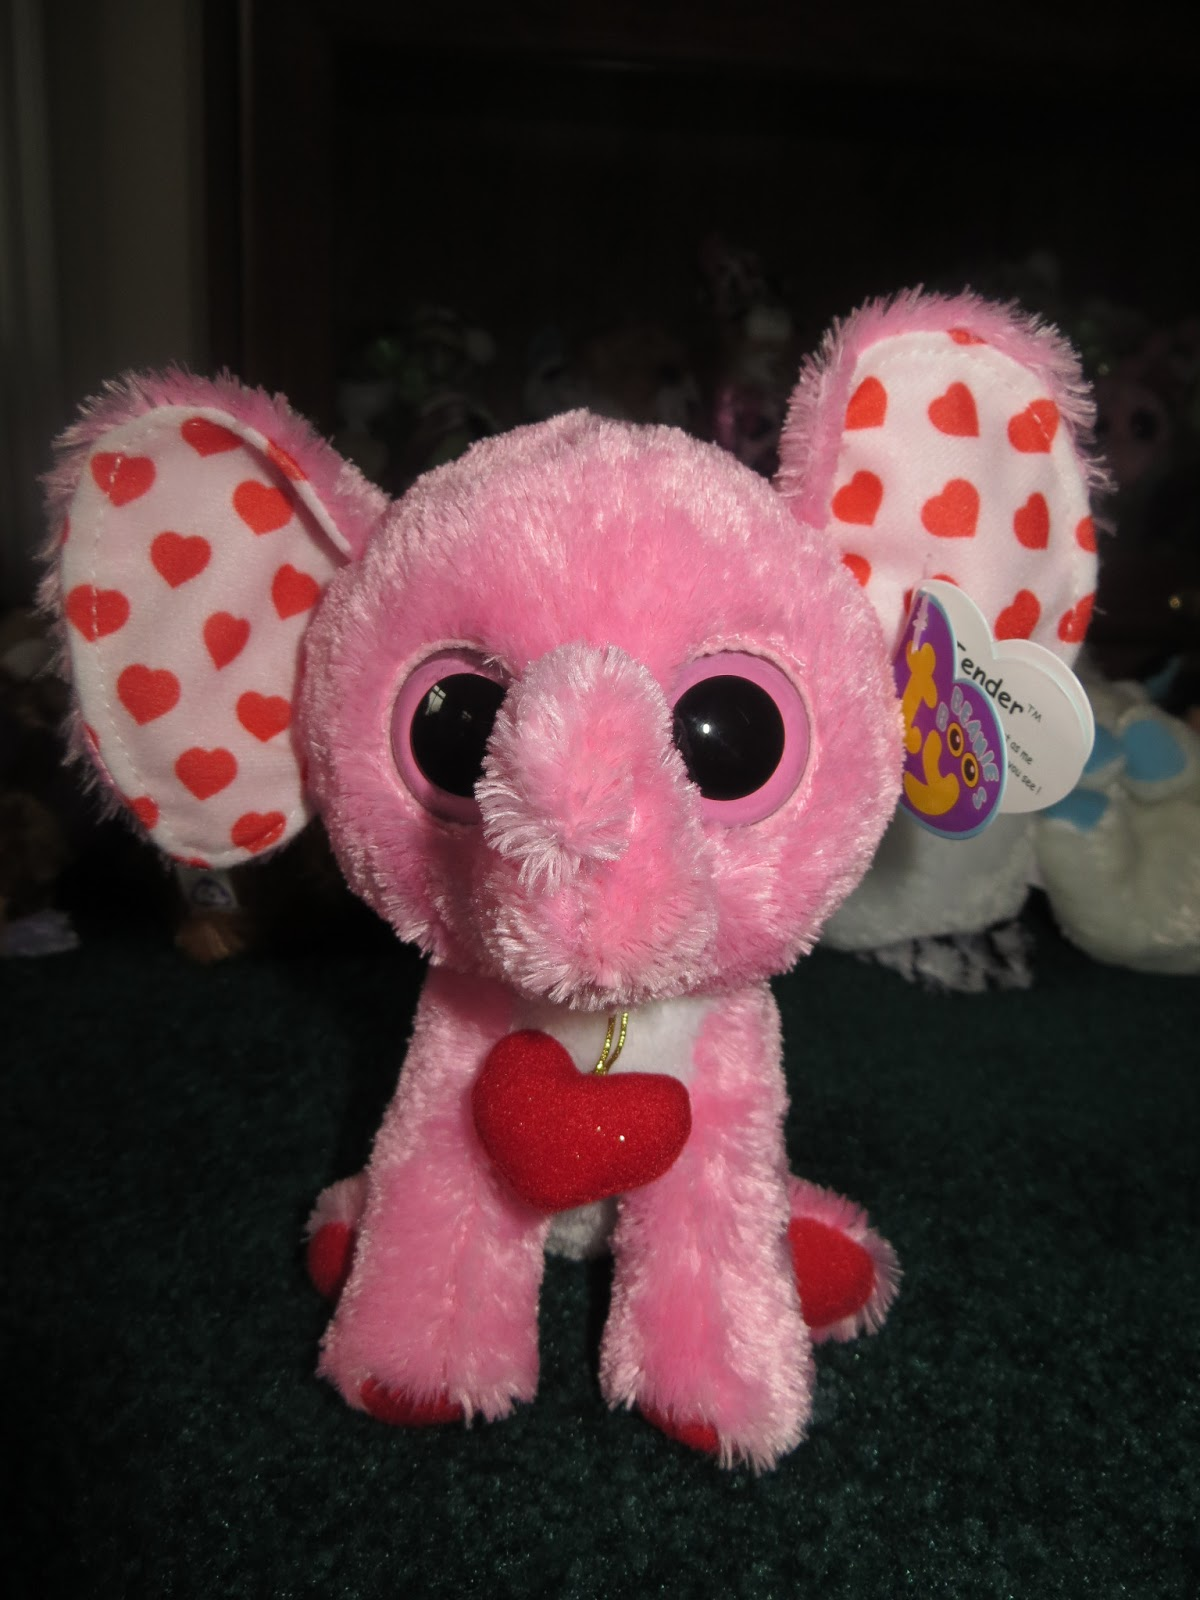 fca747bfb23 Next is JULEP (Monkey)-Birthday-February 1